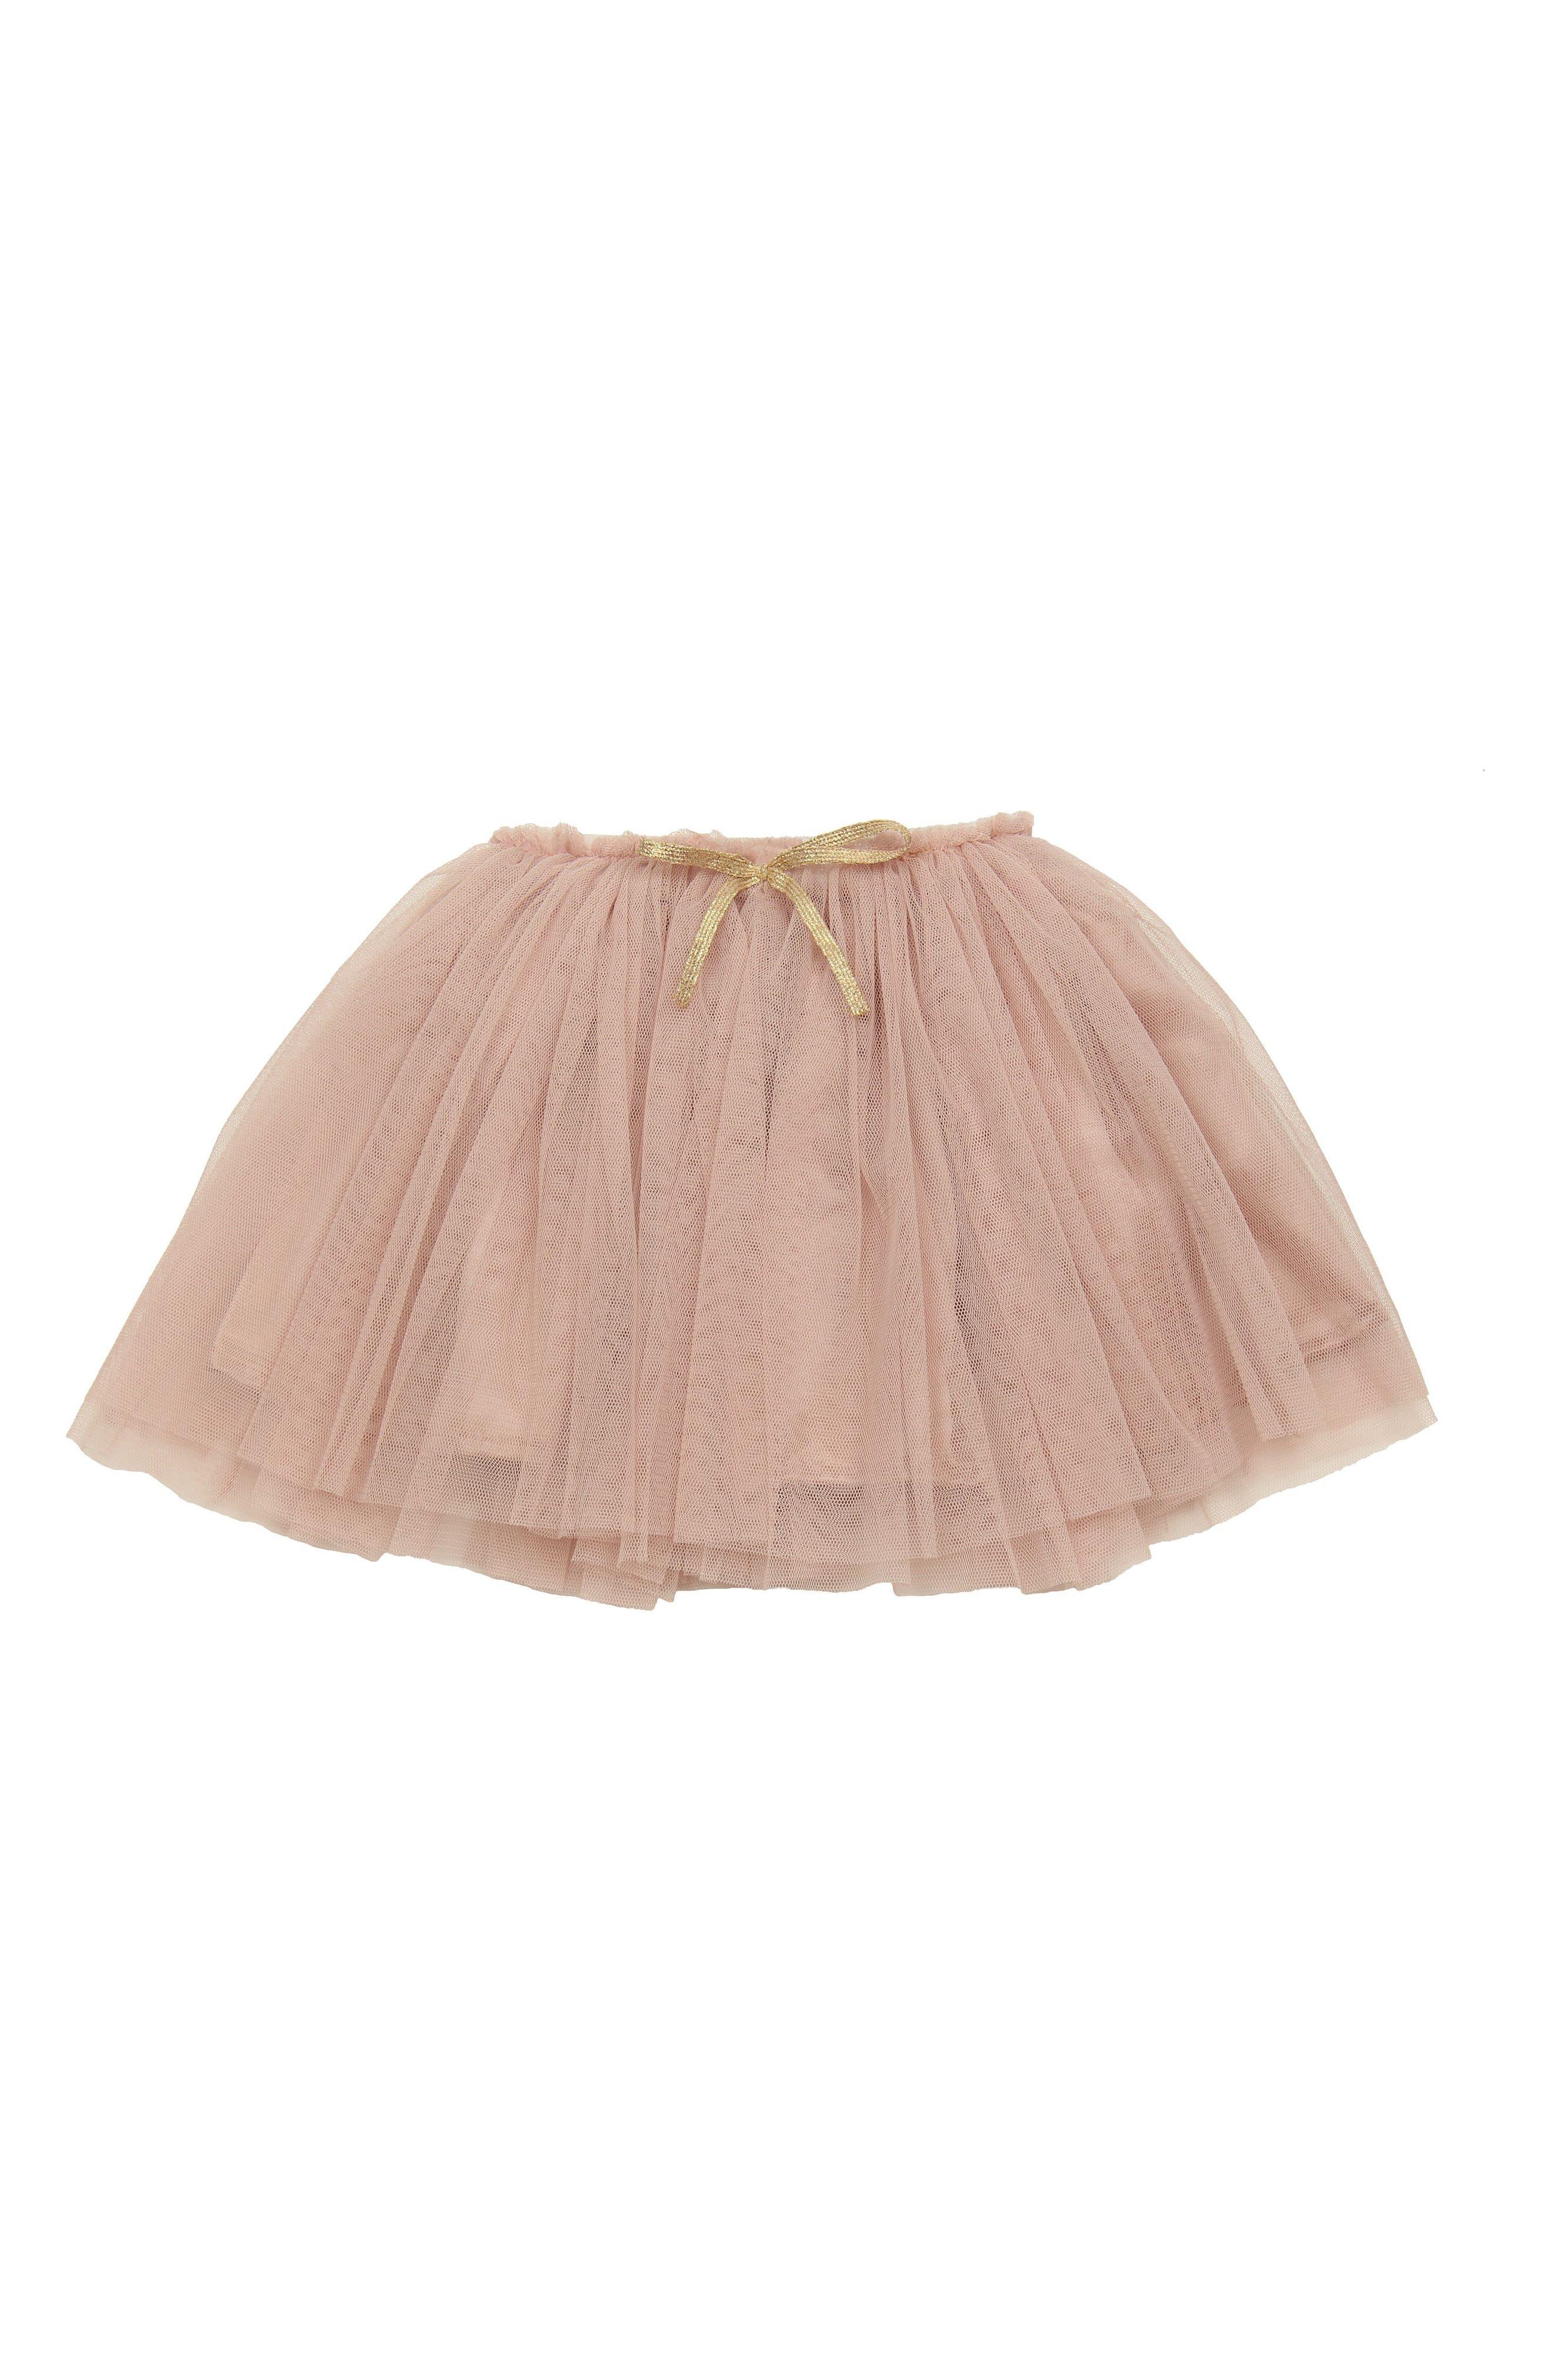 Tutu Skirt,                             Alternate thumbnail 3, color,                             DUSTY PINK